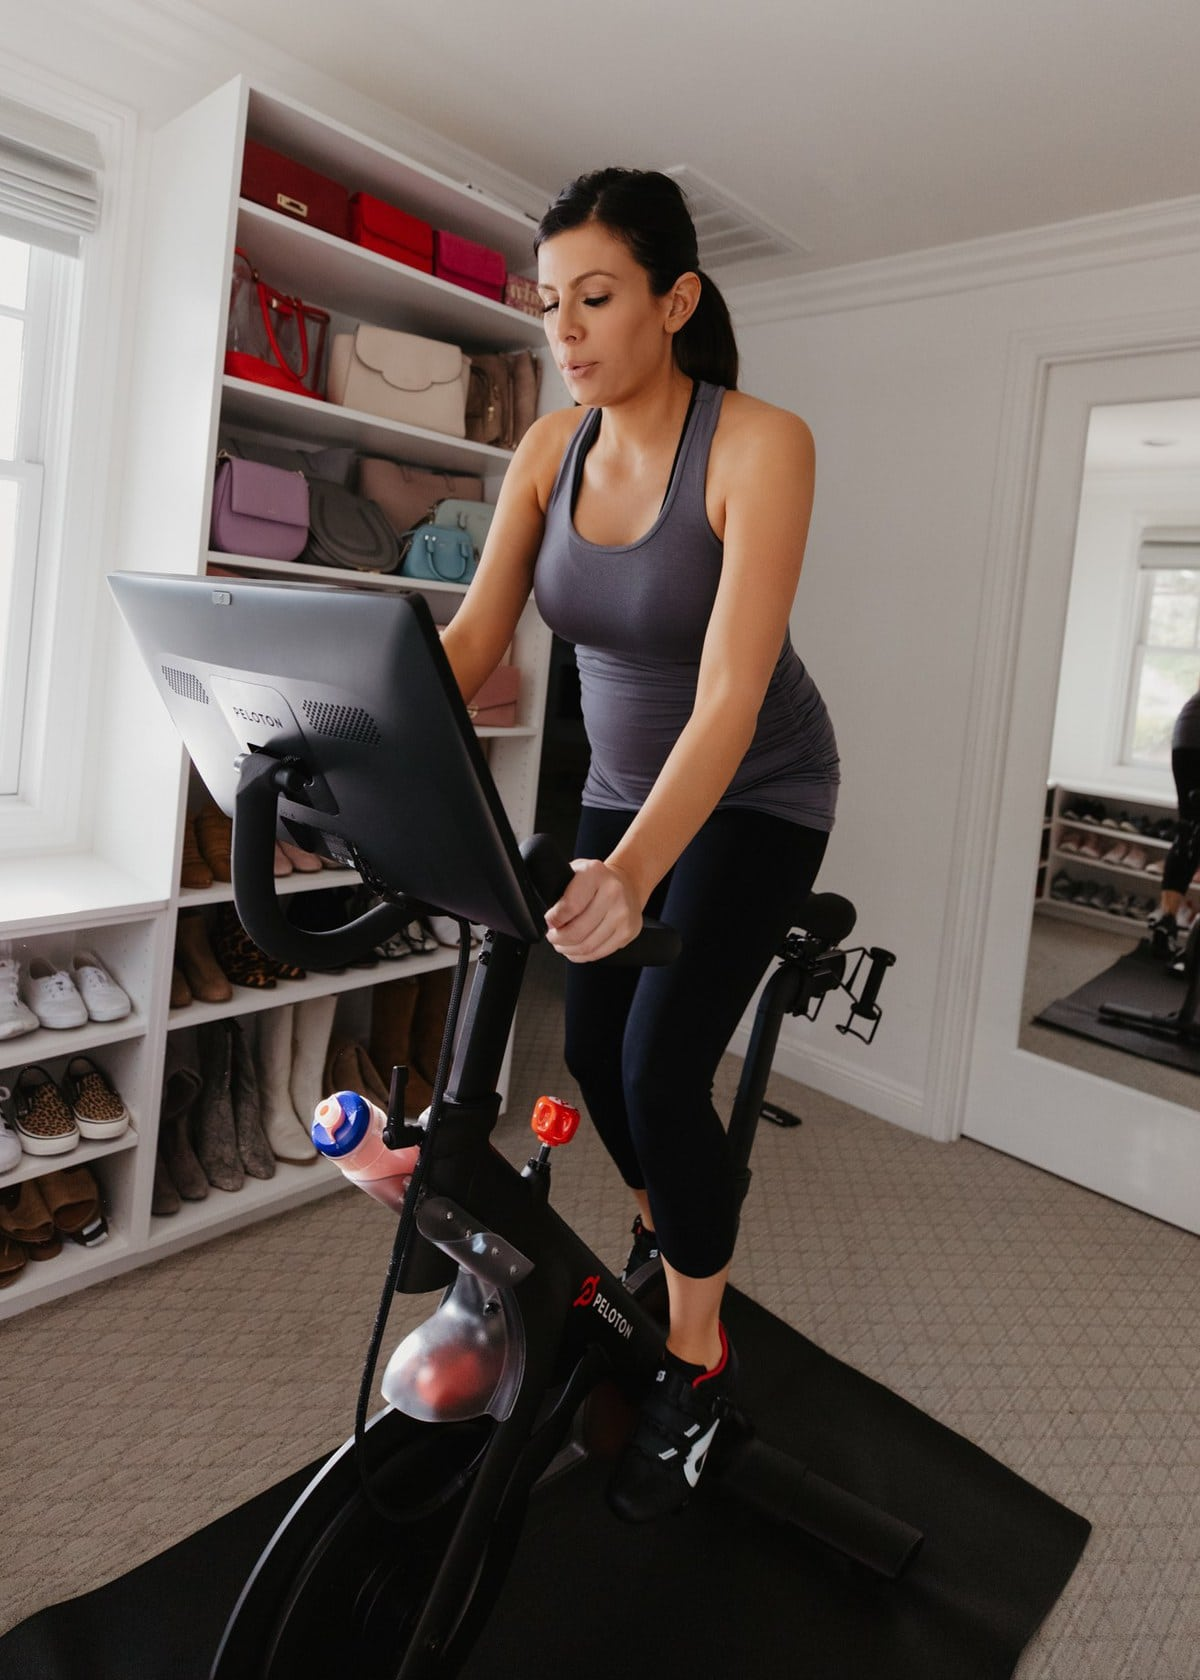 peloton at home workout